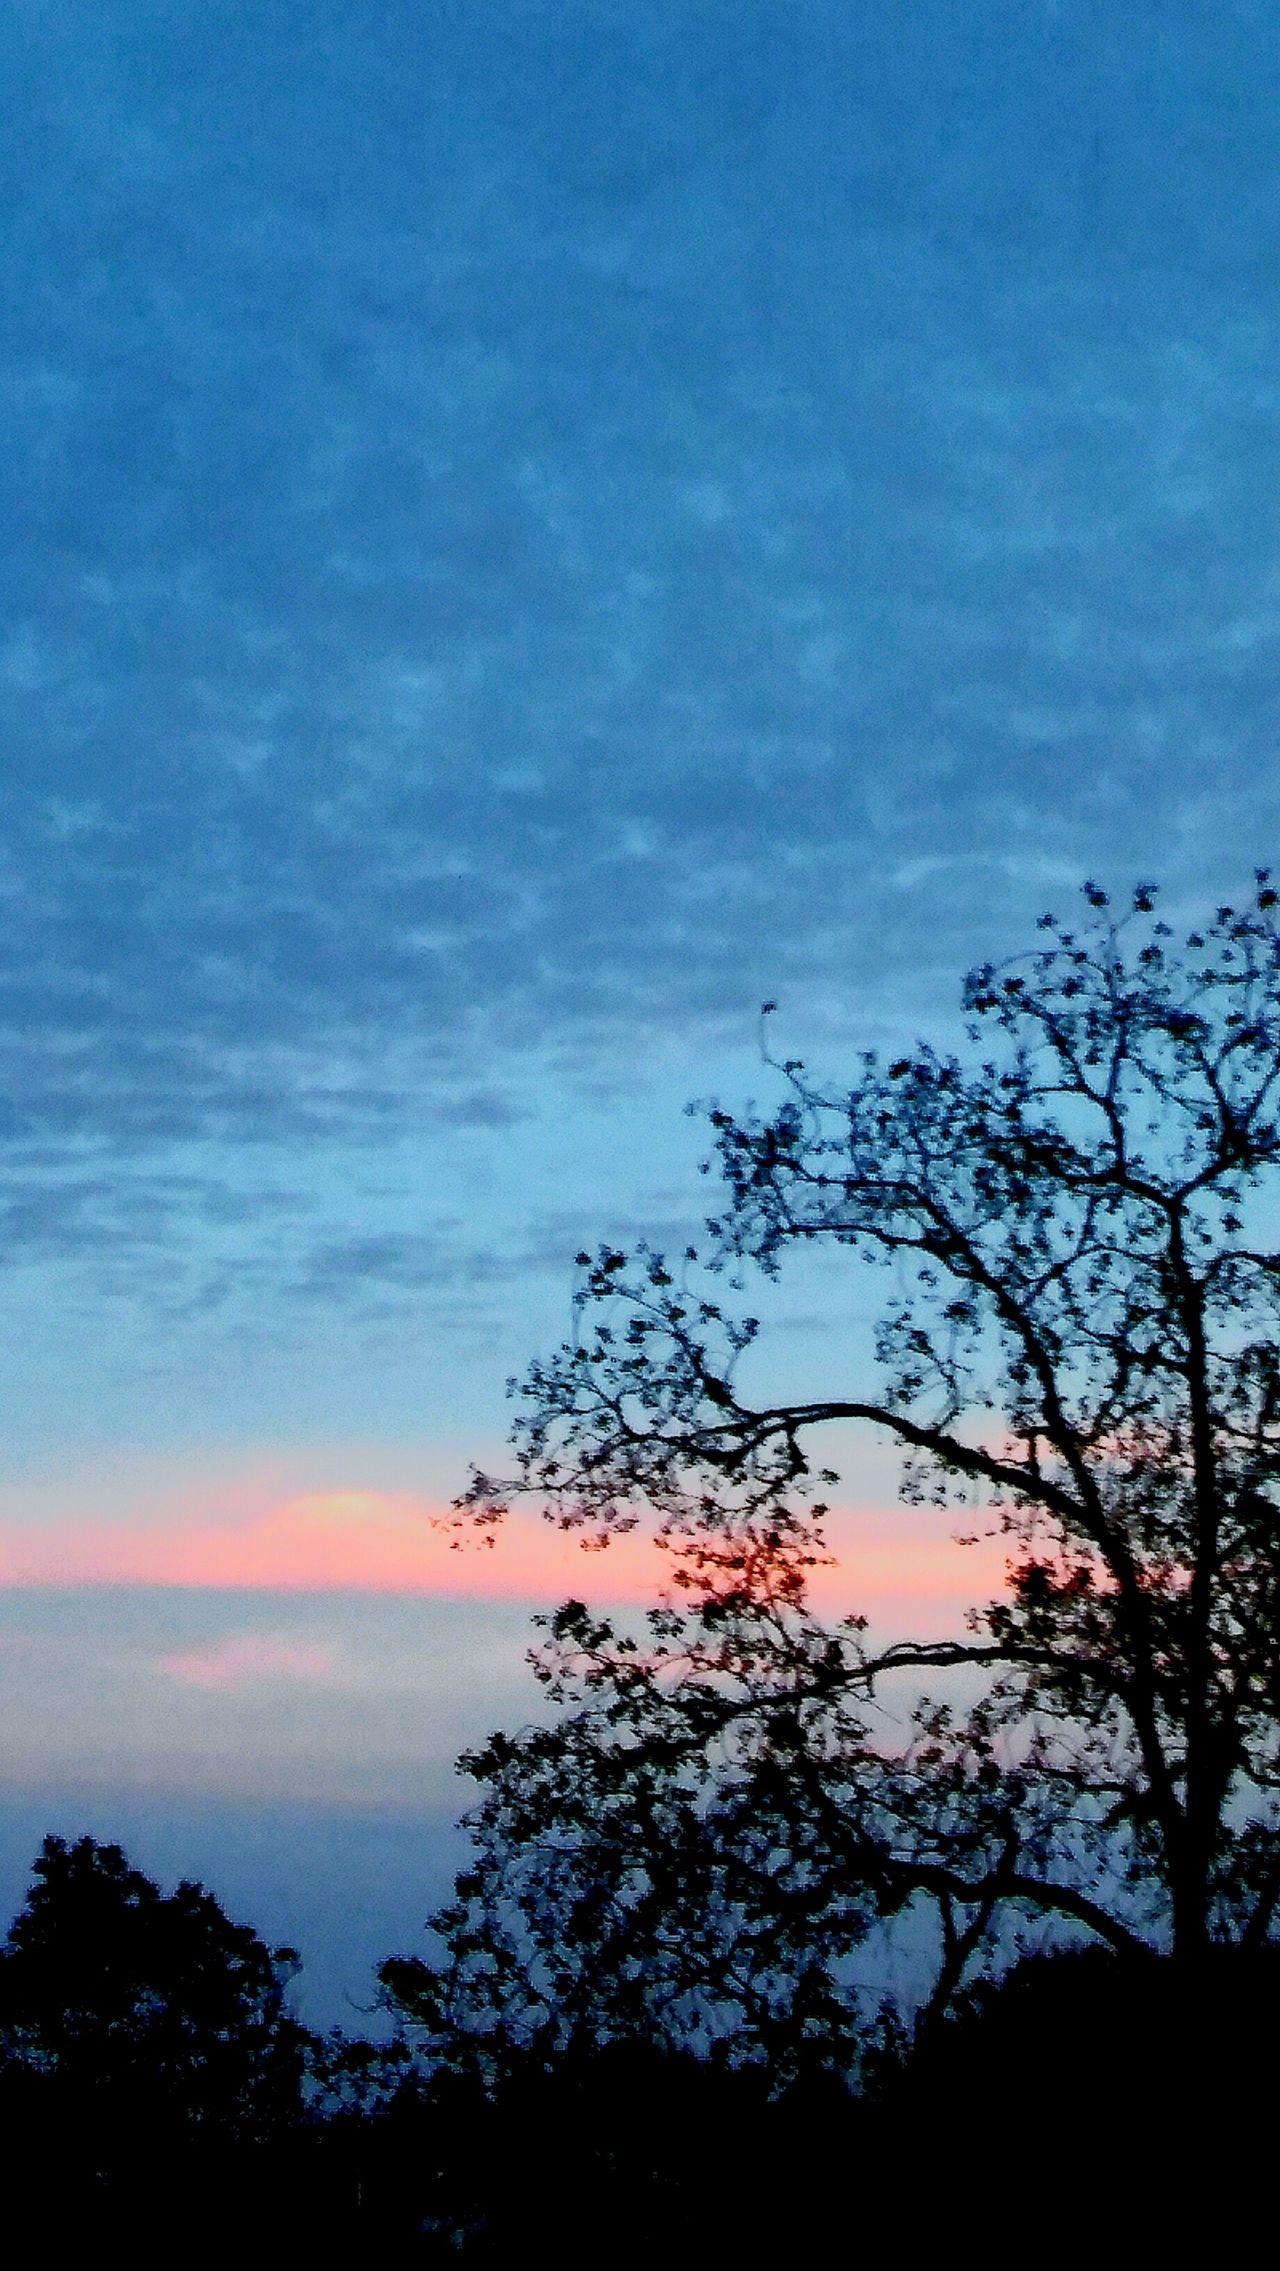 Sunset_captures sunset Tree Nature Sky Beauty In Nature Cloud - Sky No People Trees And Sky Outdoors Day Serene Outdoors Trees And Nature Fulllength Eyeembestshot_landscape EyeEmBestShot's Sunset And Clouds  Beauty In Nature